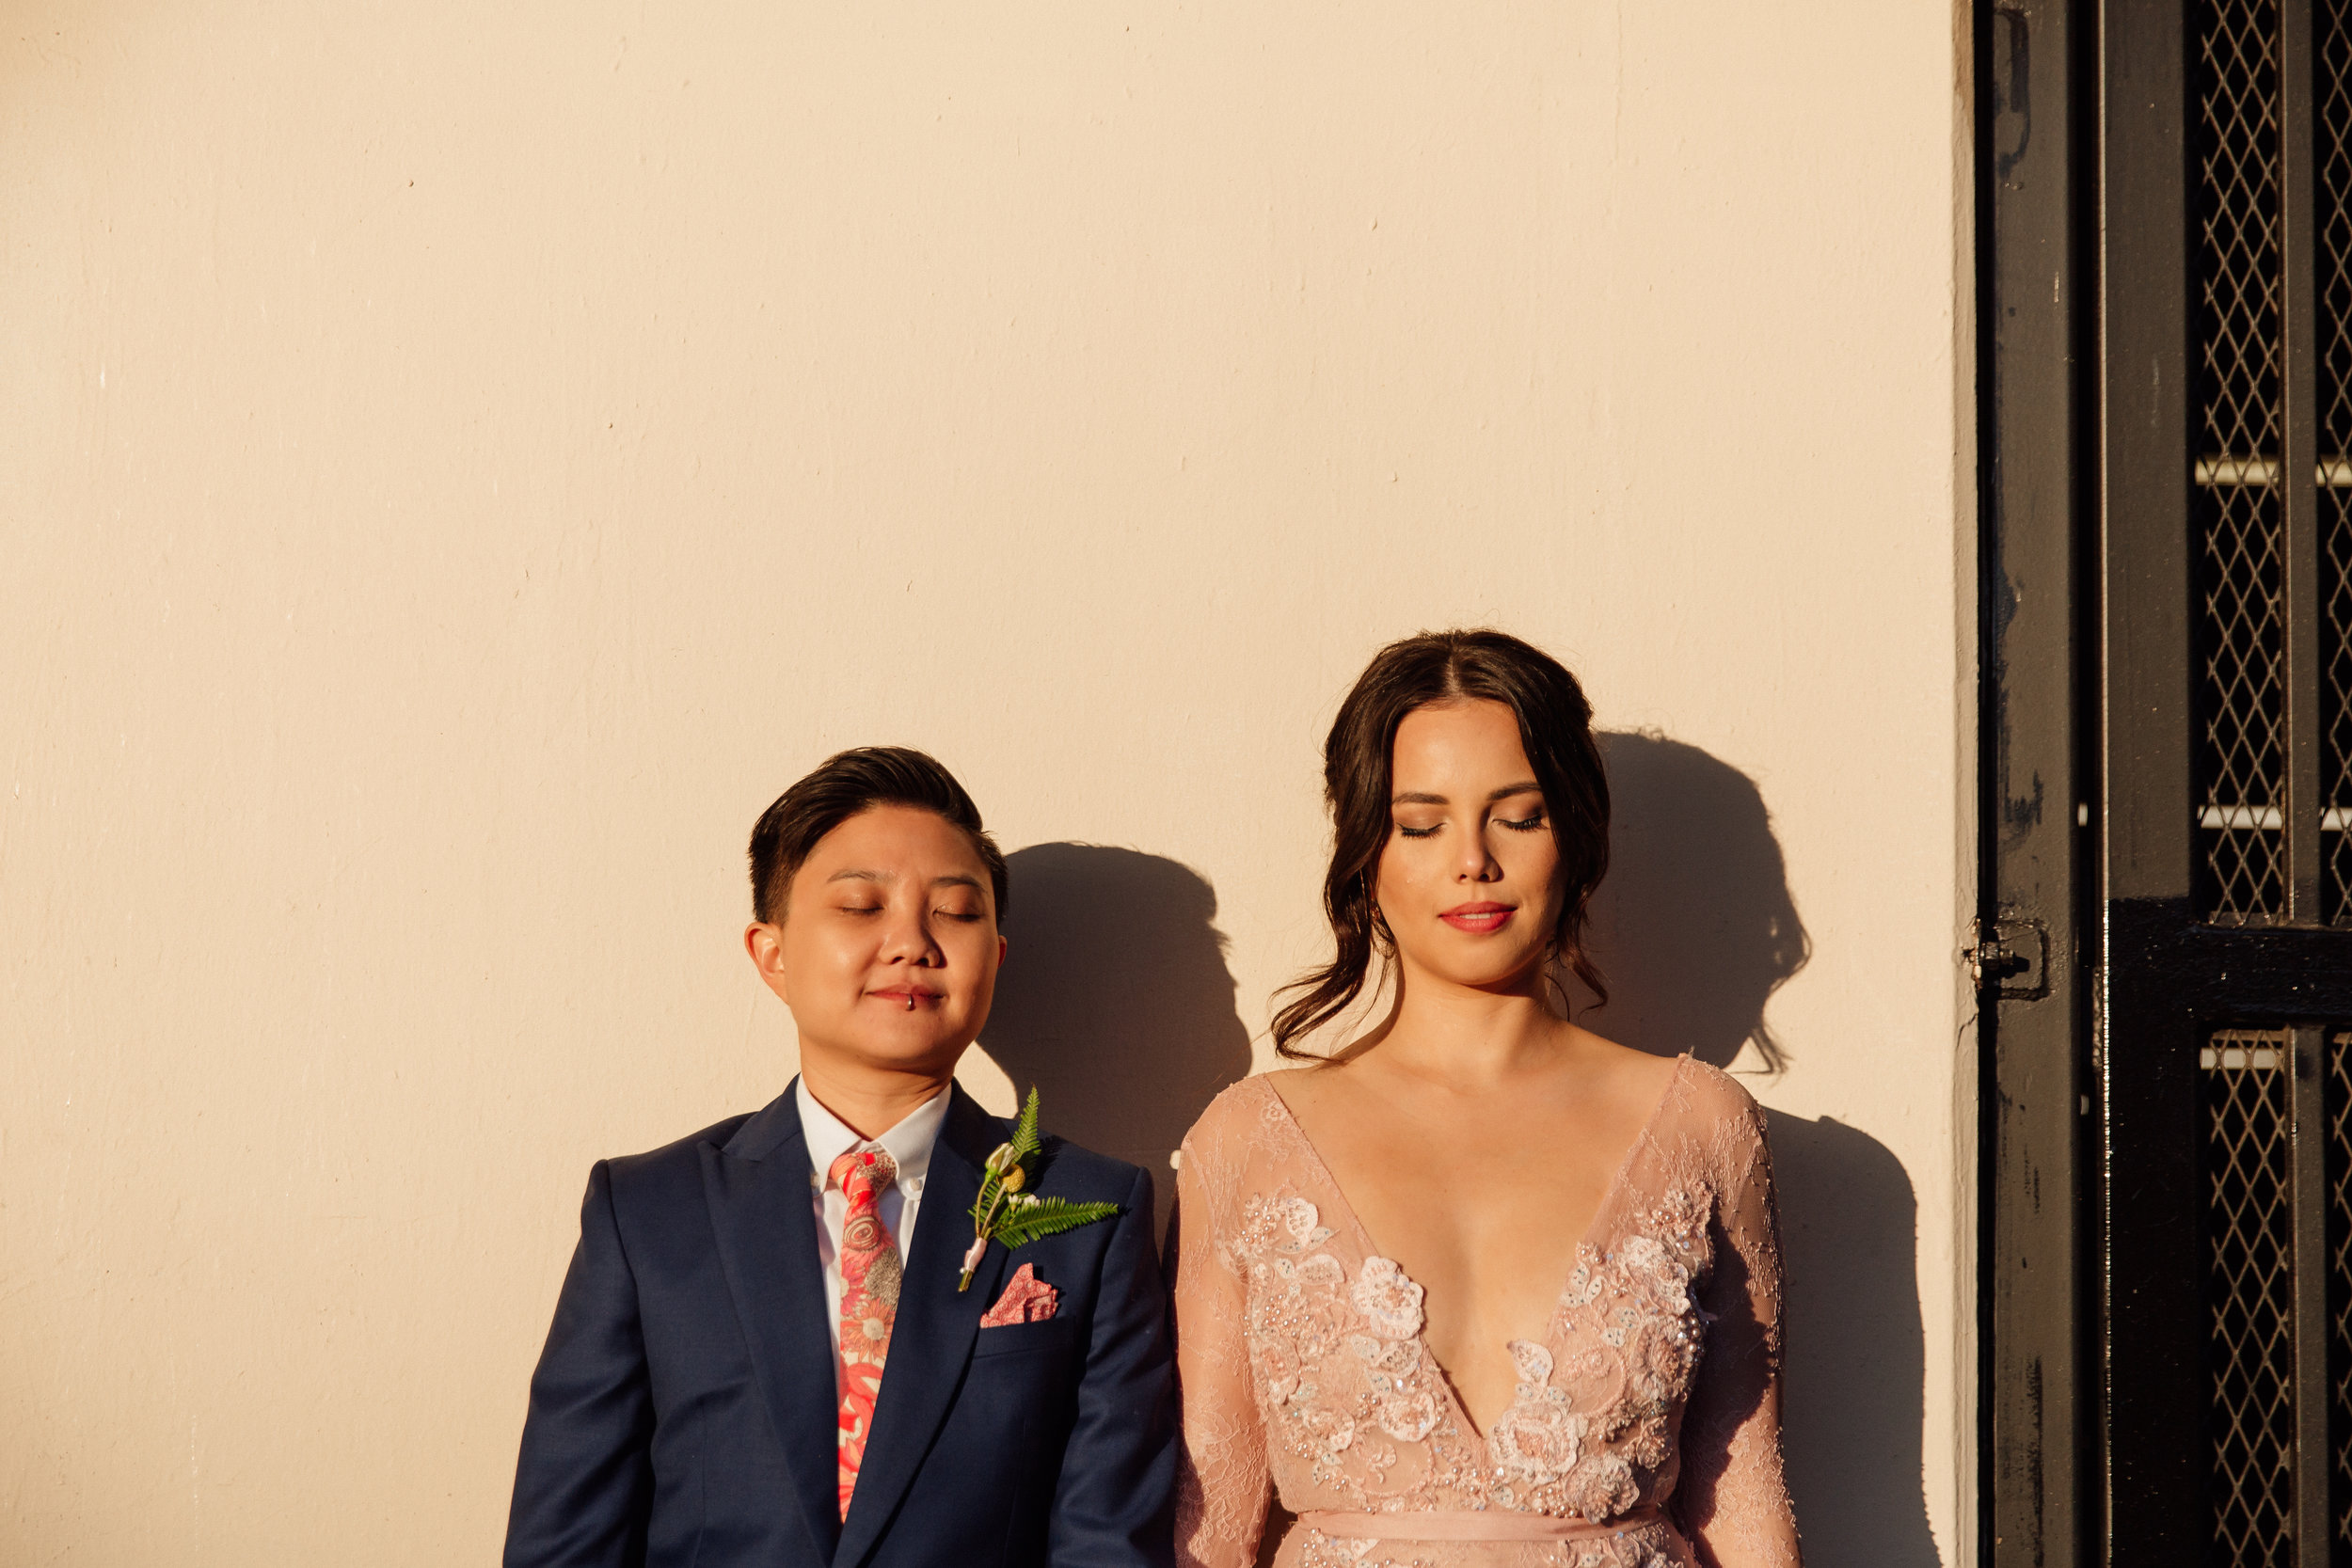 millwick-wedding-marble-rye-photography-030118-portraits-047.jpg